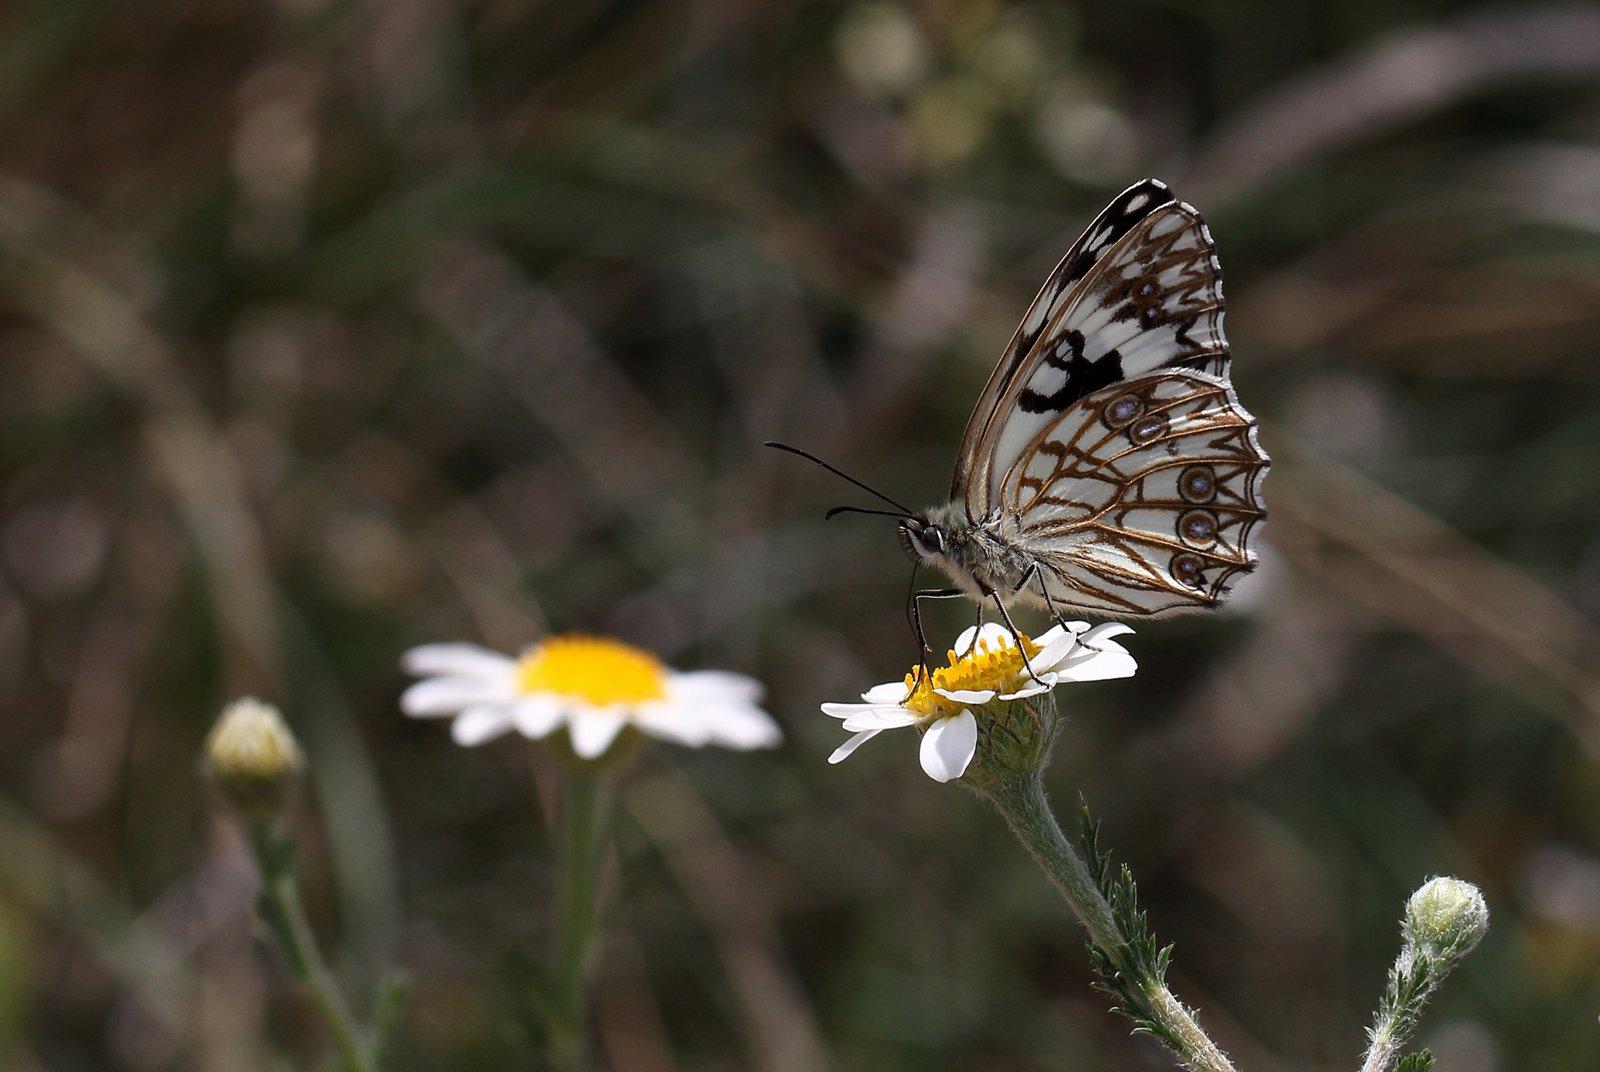 Middelhavs Skakbrætsommerfugl, Melanargia occitanica